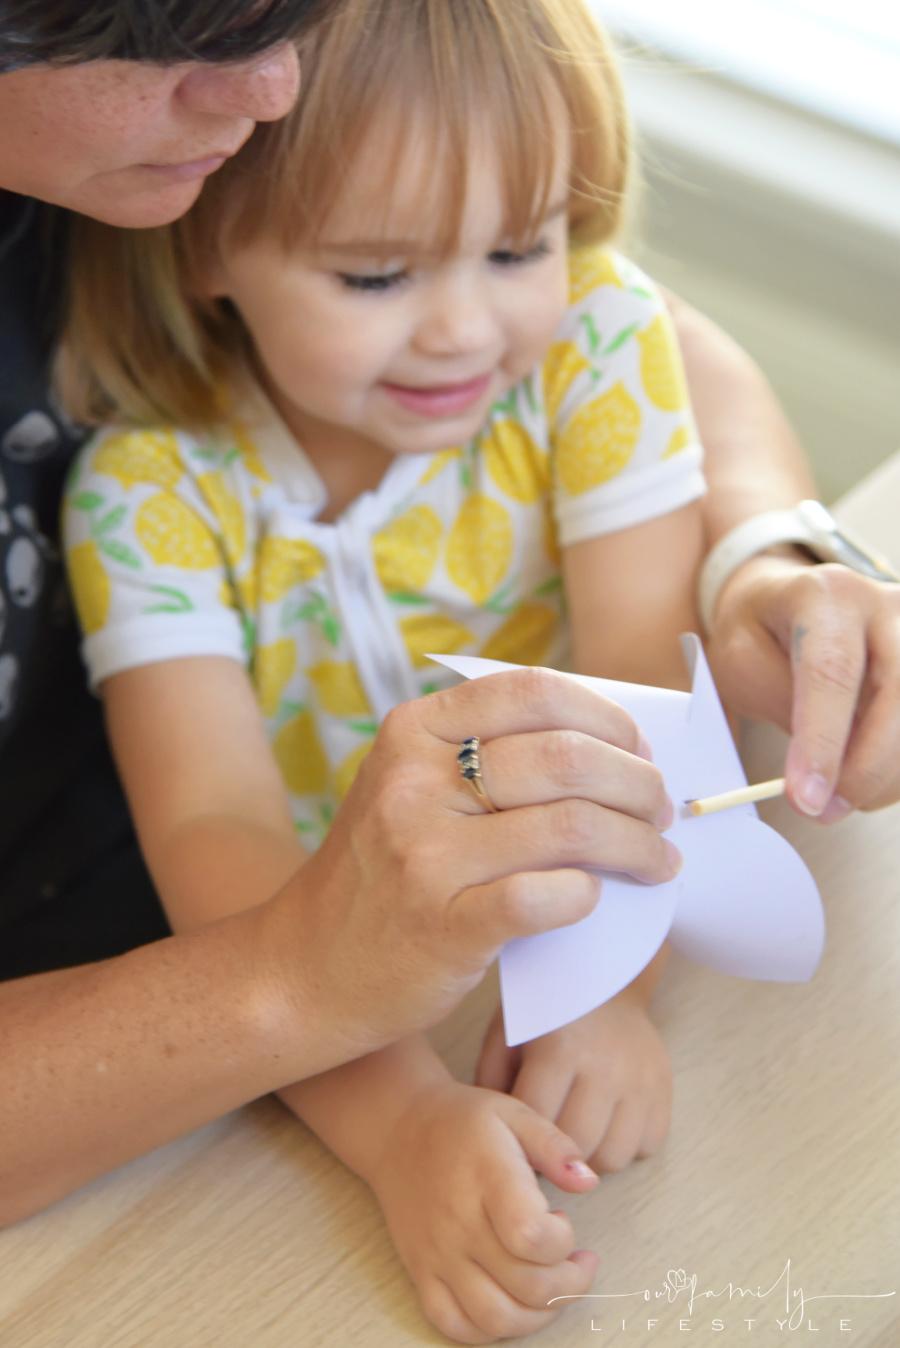 grandma and toddler making paper pinwheels with thumbtack